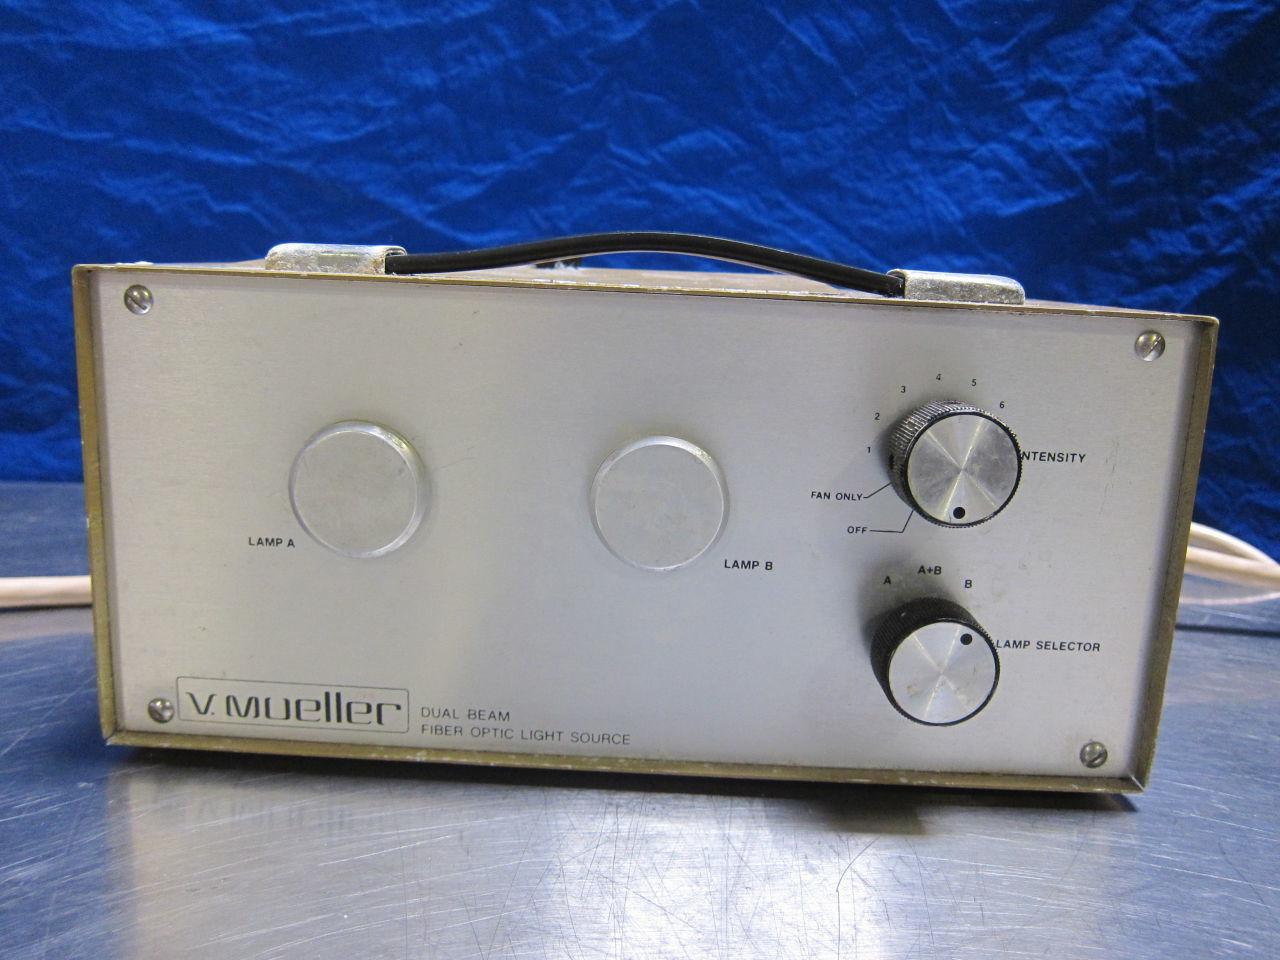 V. MUELLER Dual Beam Light Source for sale